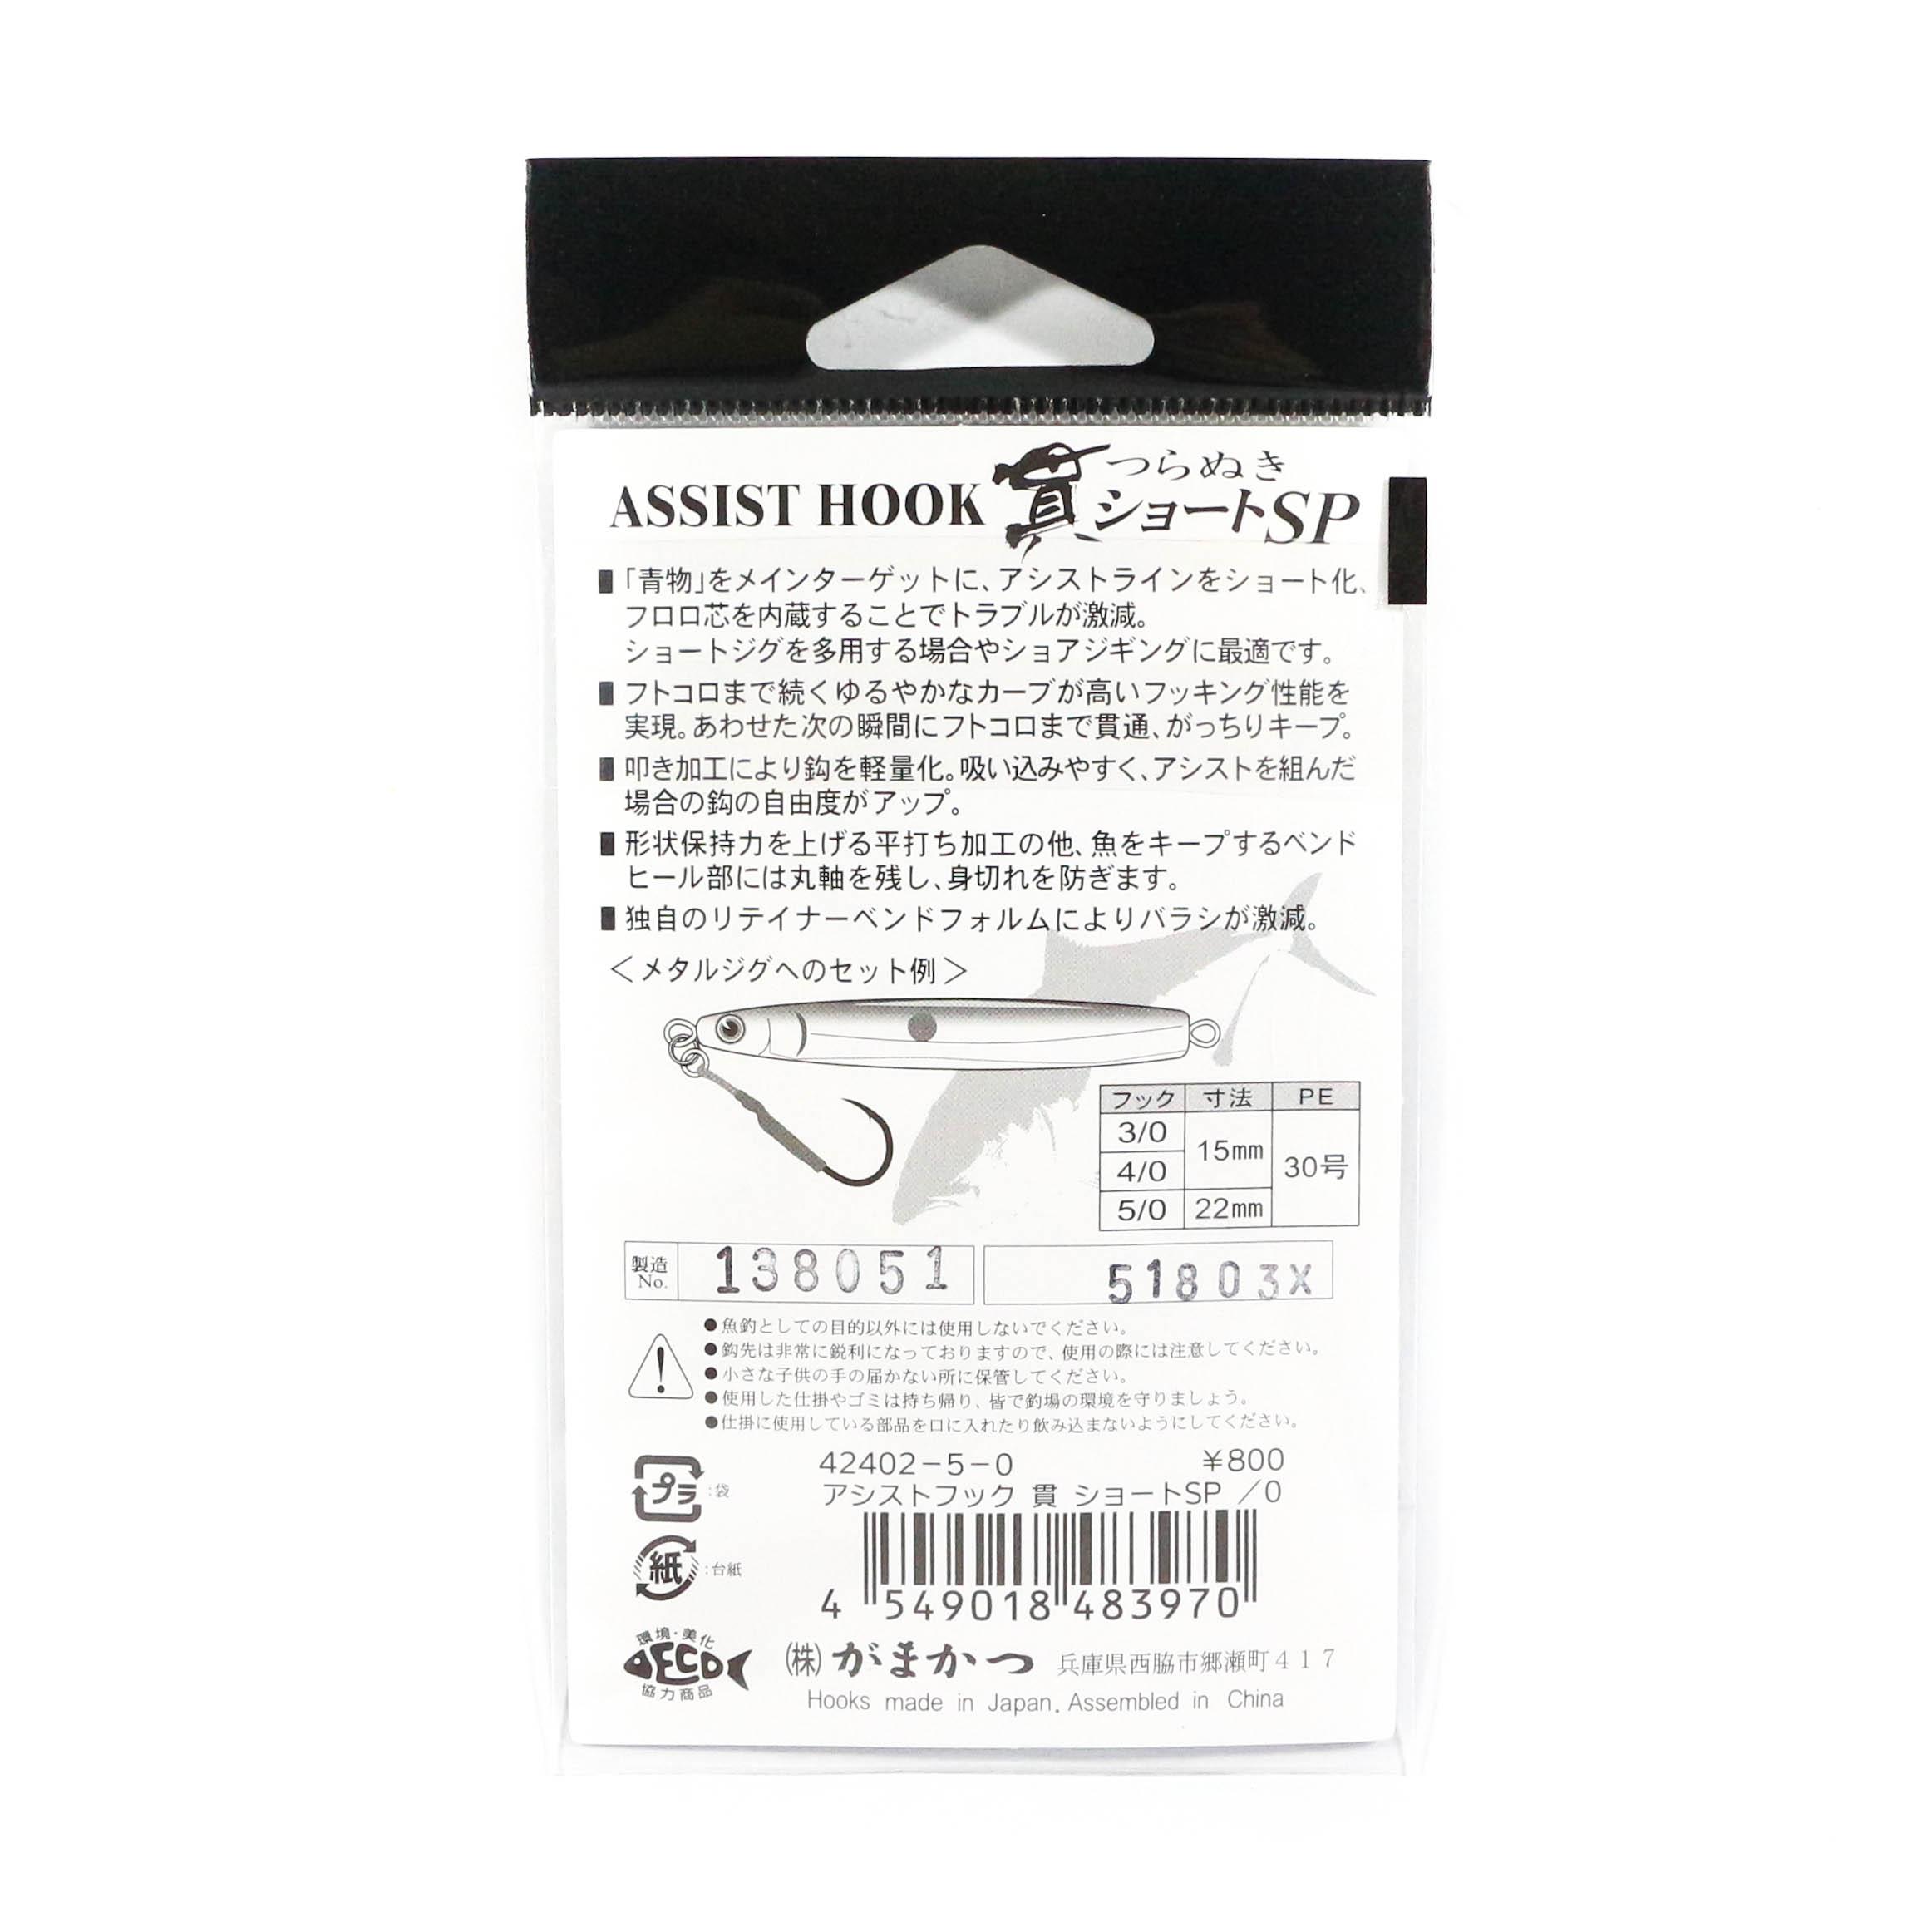 3963 Gamakatsu GA-027 Assist SP Short Special Jigging Size 4//0